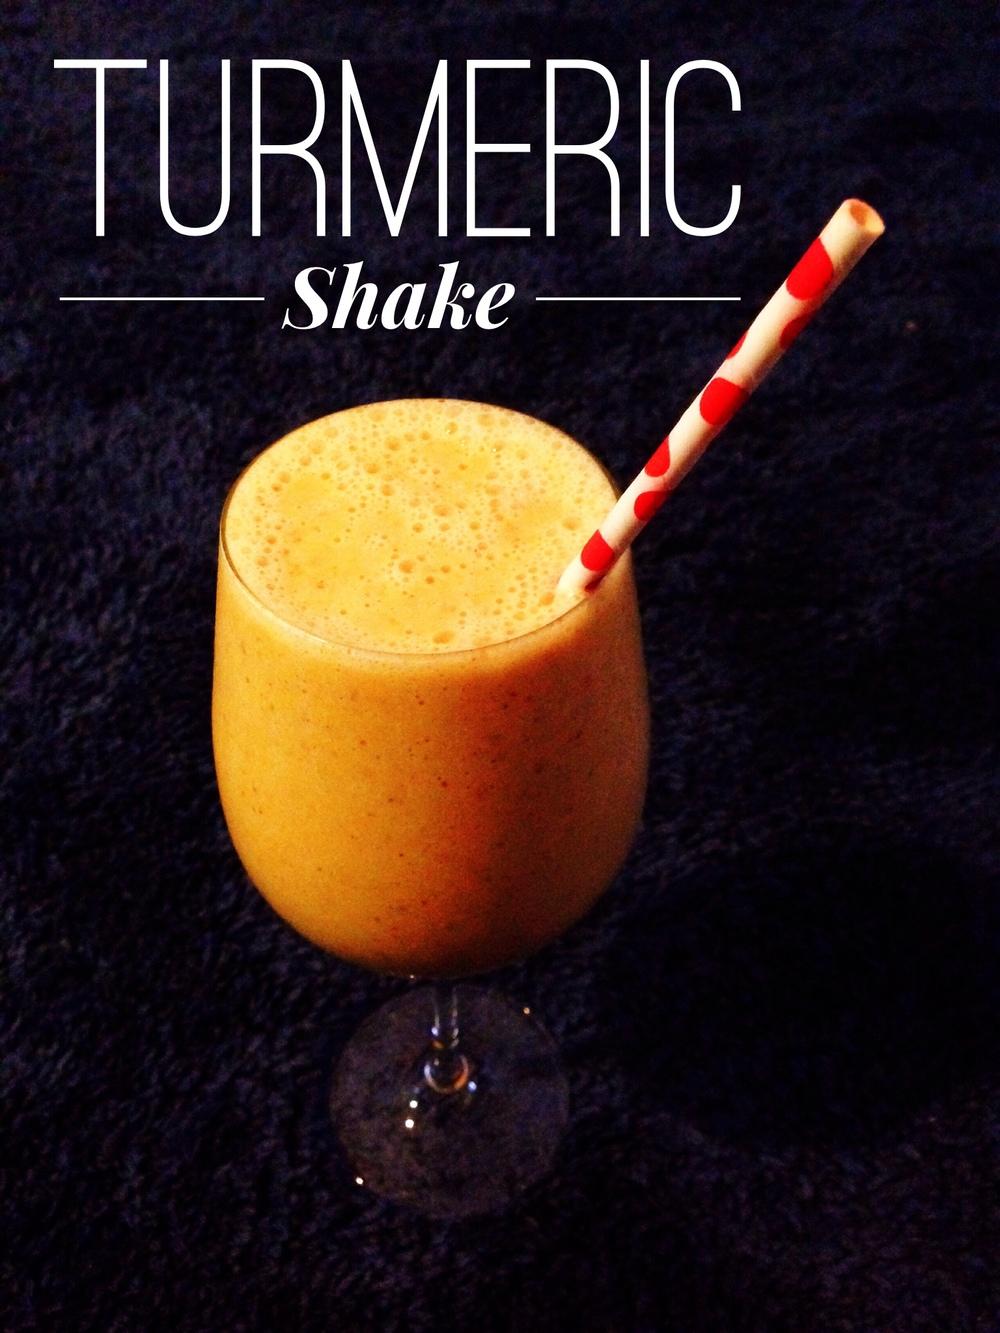 friday-foodie-kathy-gardiner-tumeric-shake